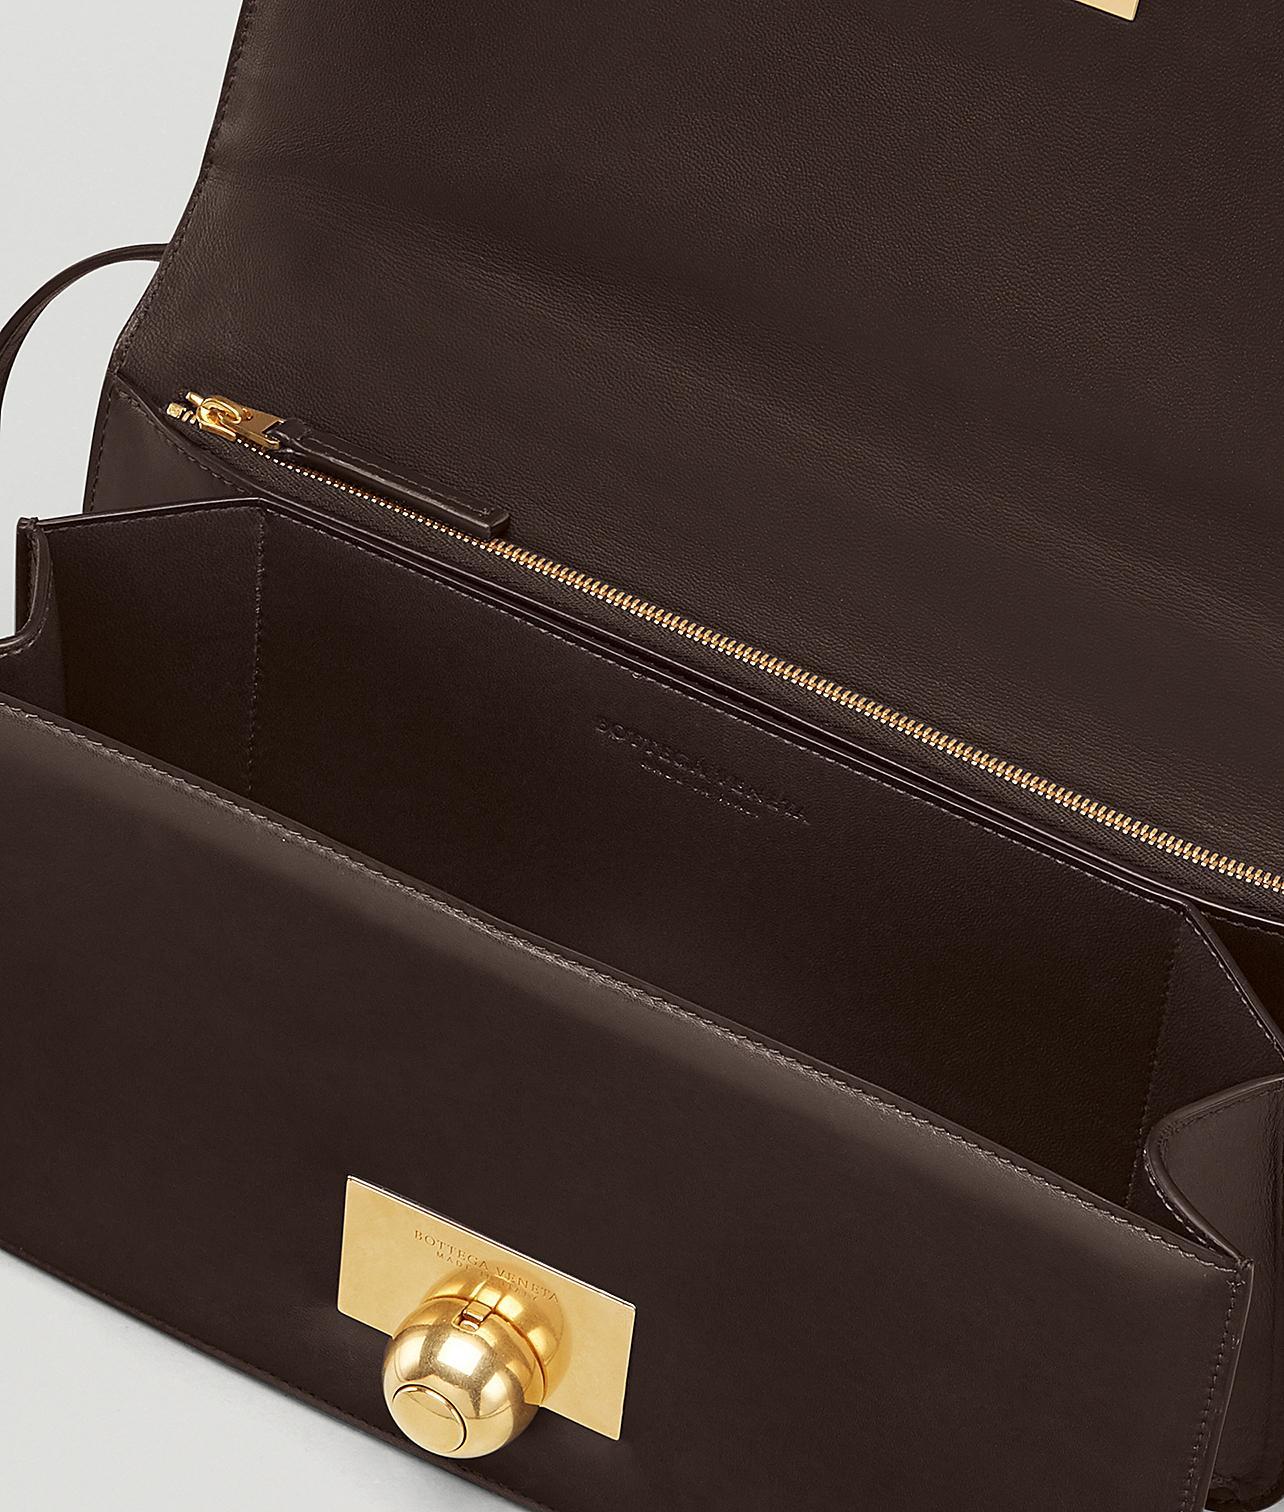 BOTTEGA VENETA Spazzolato Calfskin Classic Mini BV Bag